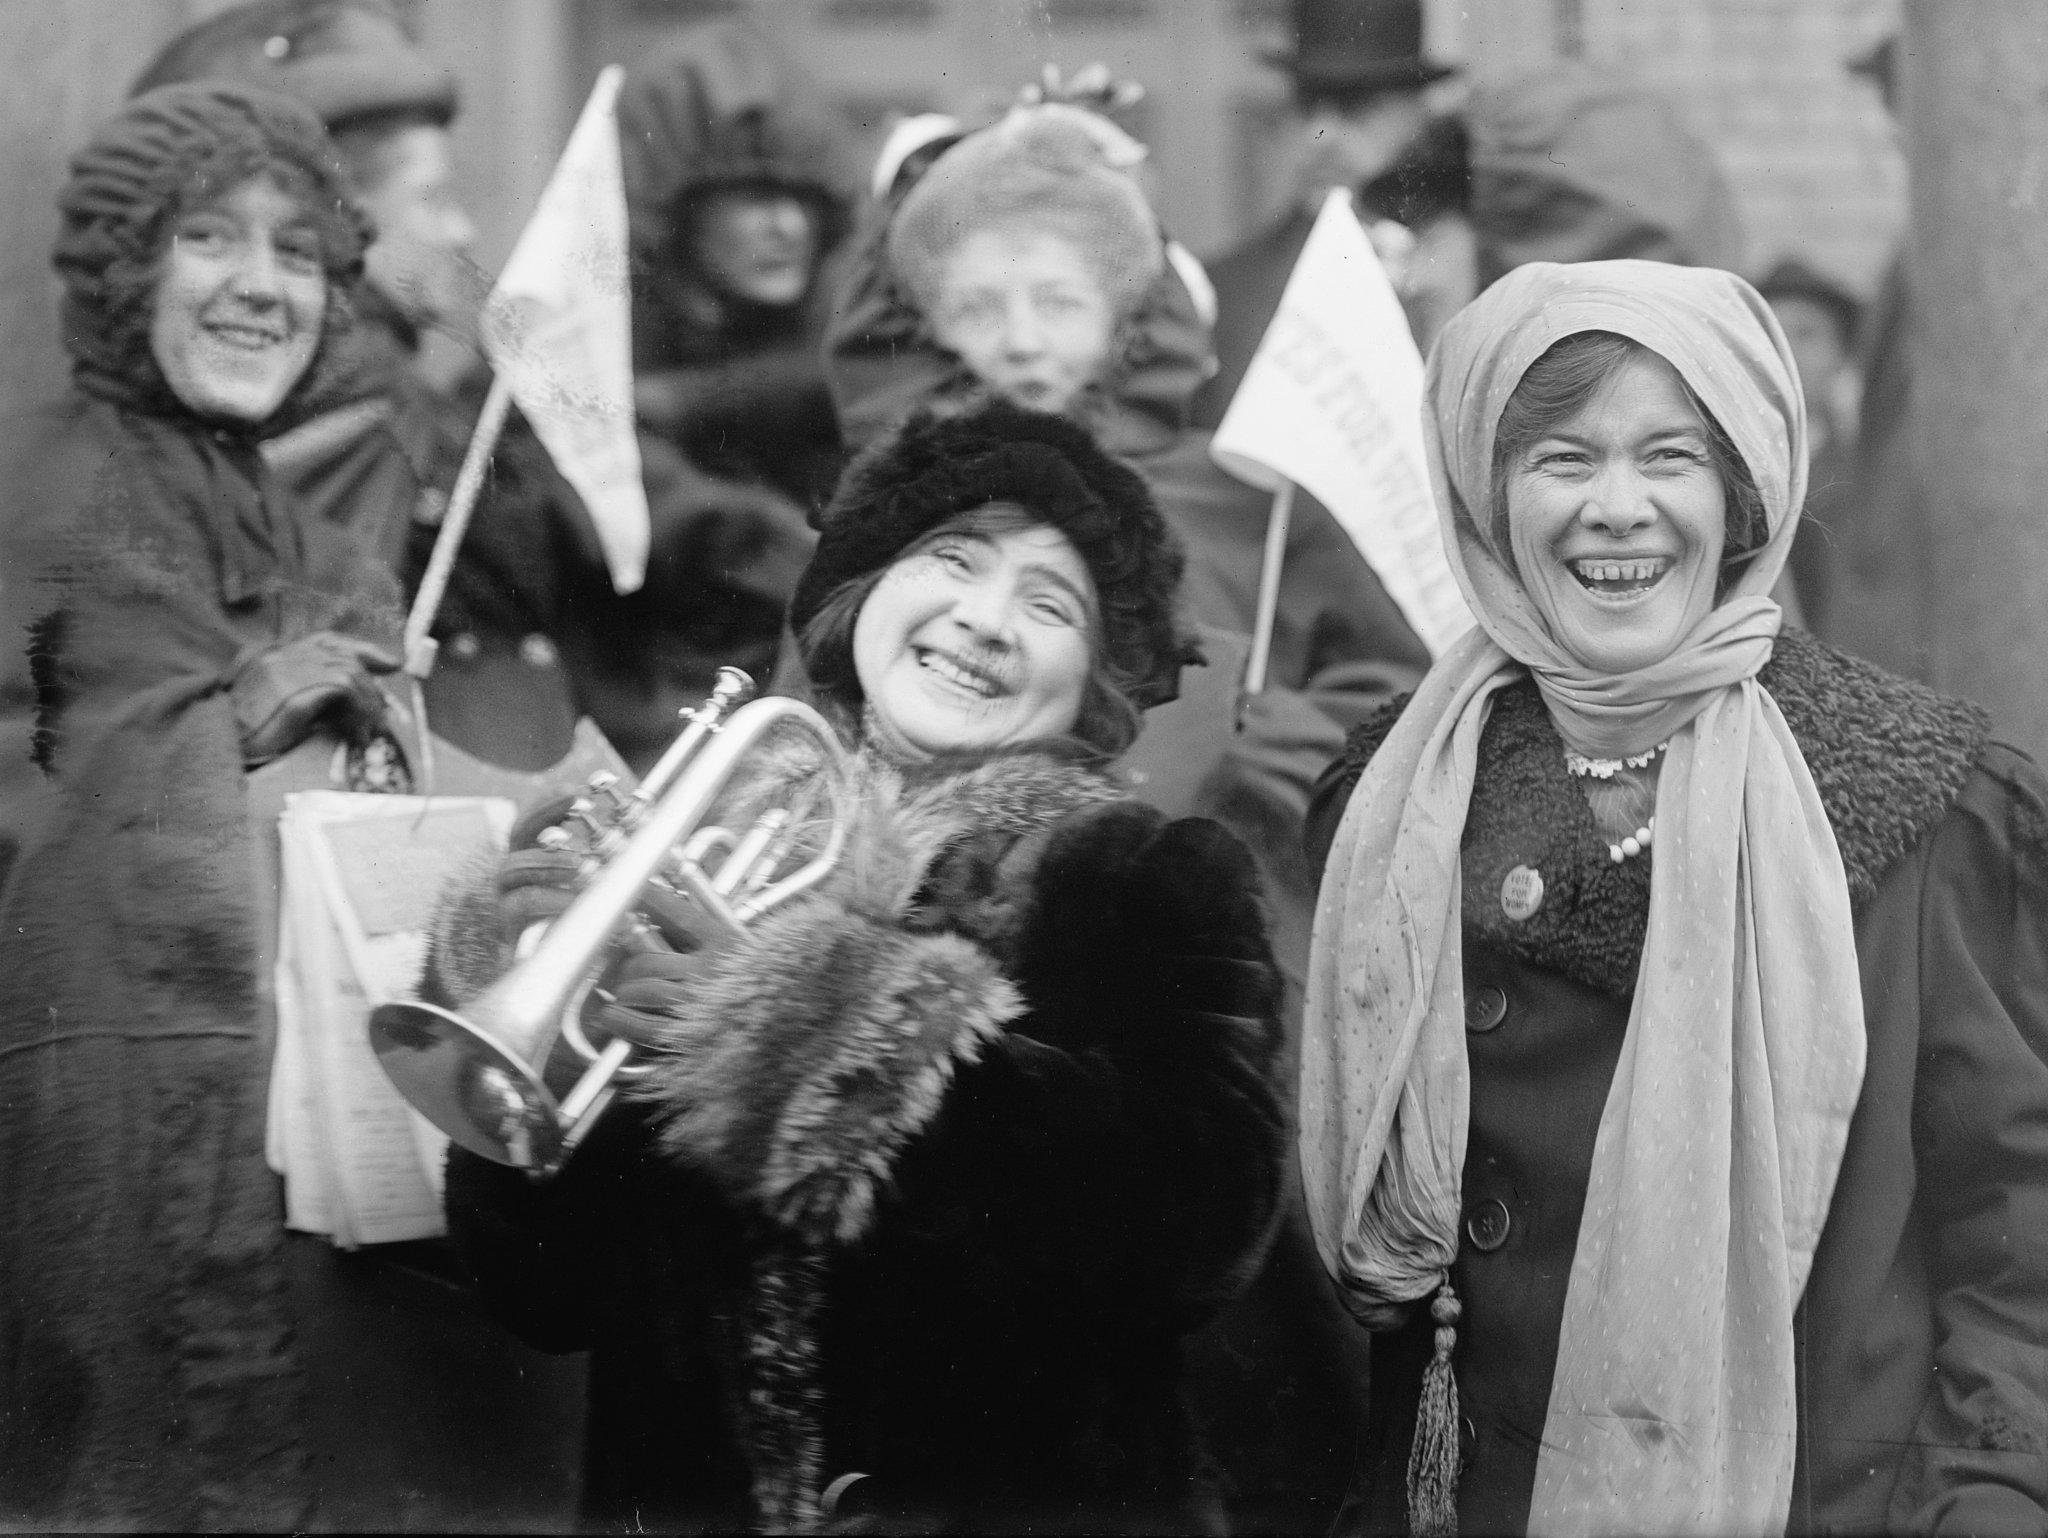 Women's Suffrage in US, 1913